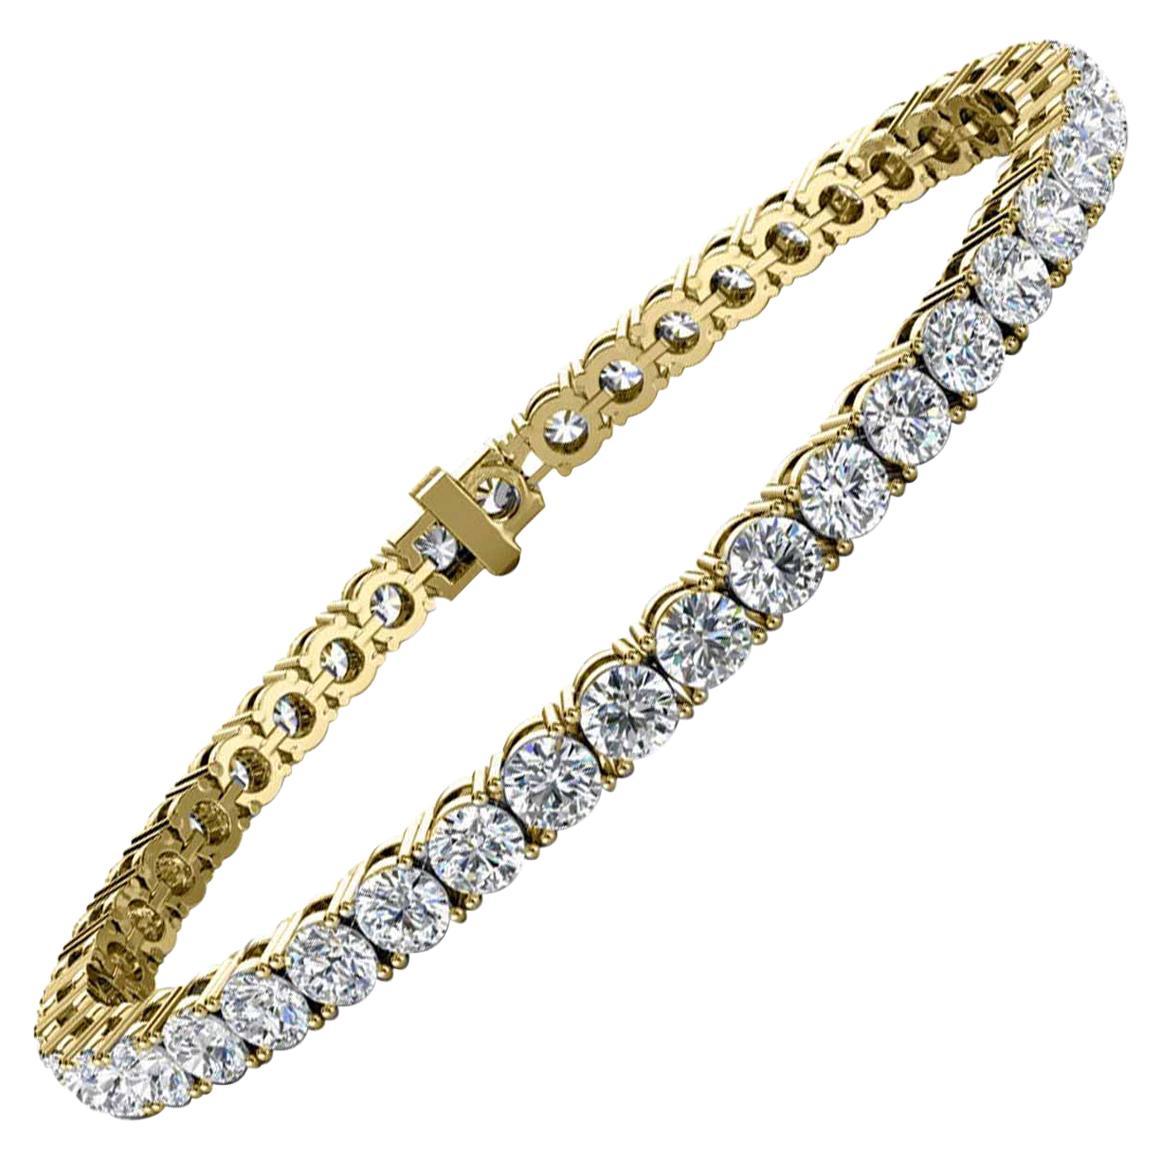 18 Karat Yellow Gold Four Prongs Diamond Tennis Bracelet '8 Carat'